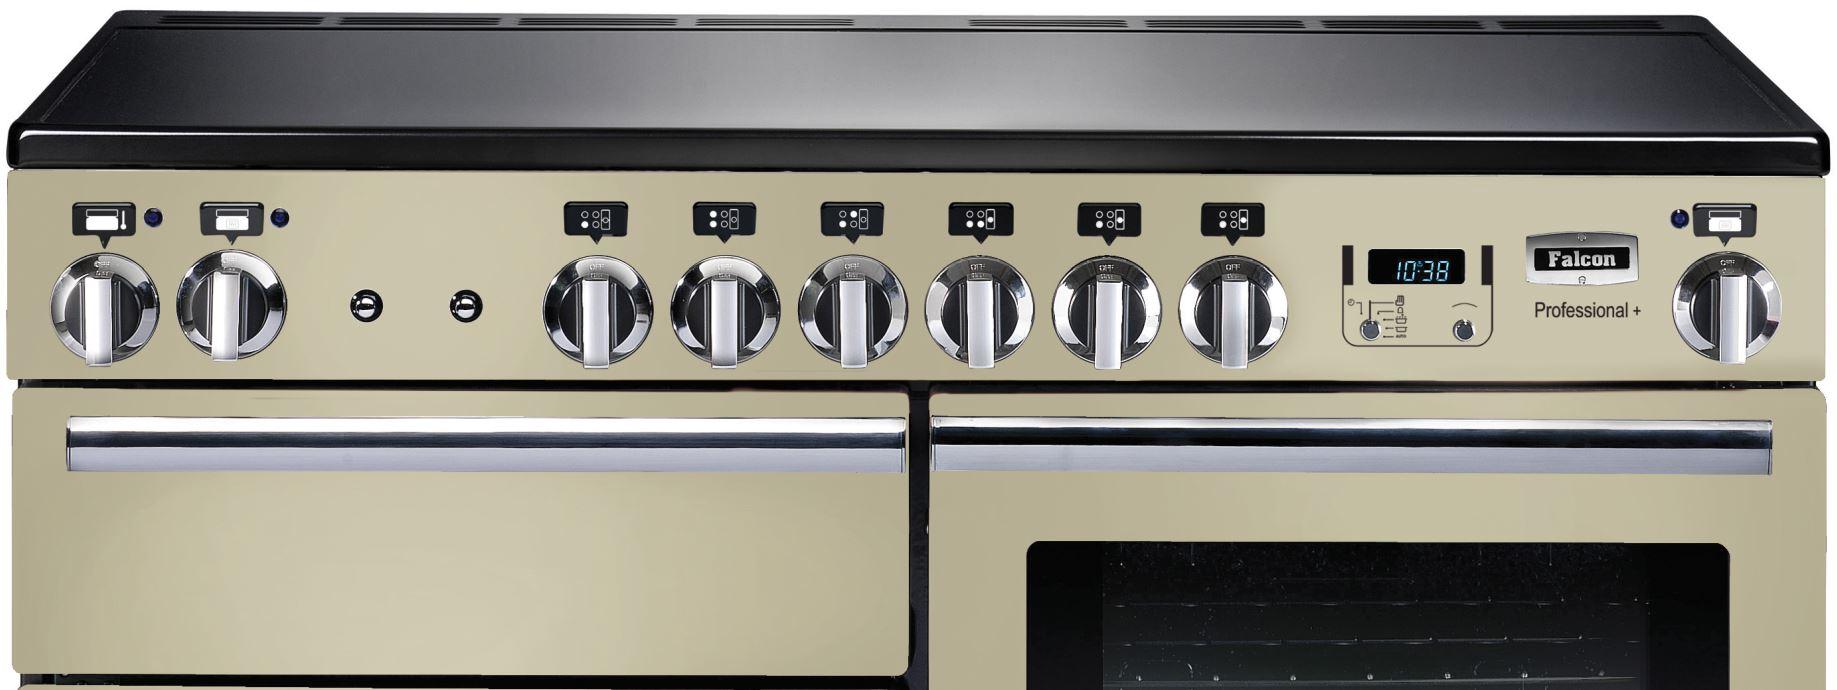 informationsseite h ttich falcon professional 110 range cooker elektroherd mit. Black Bedroom Furniture Sets. Home Design Ideas